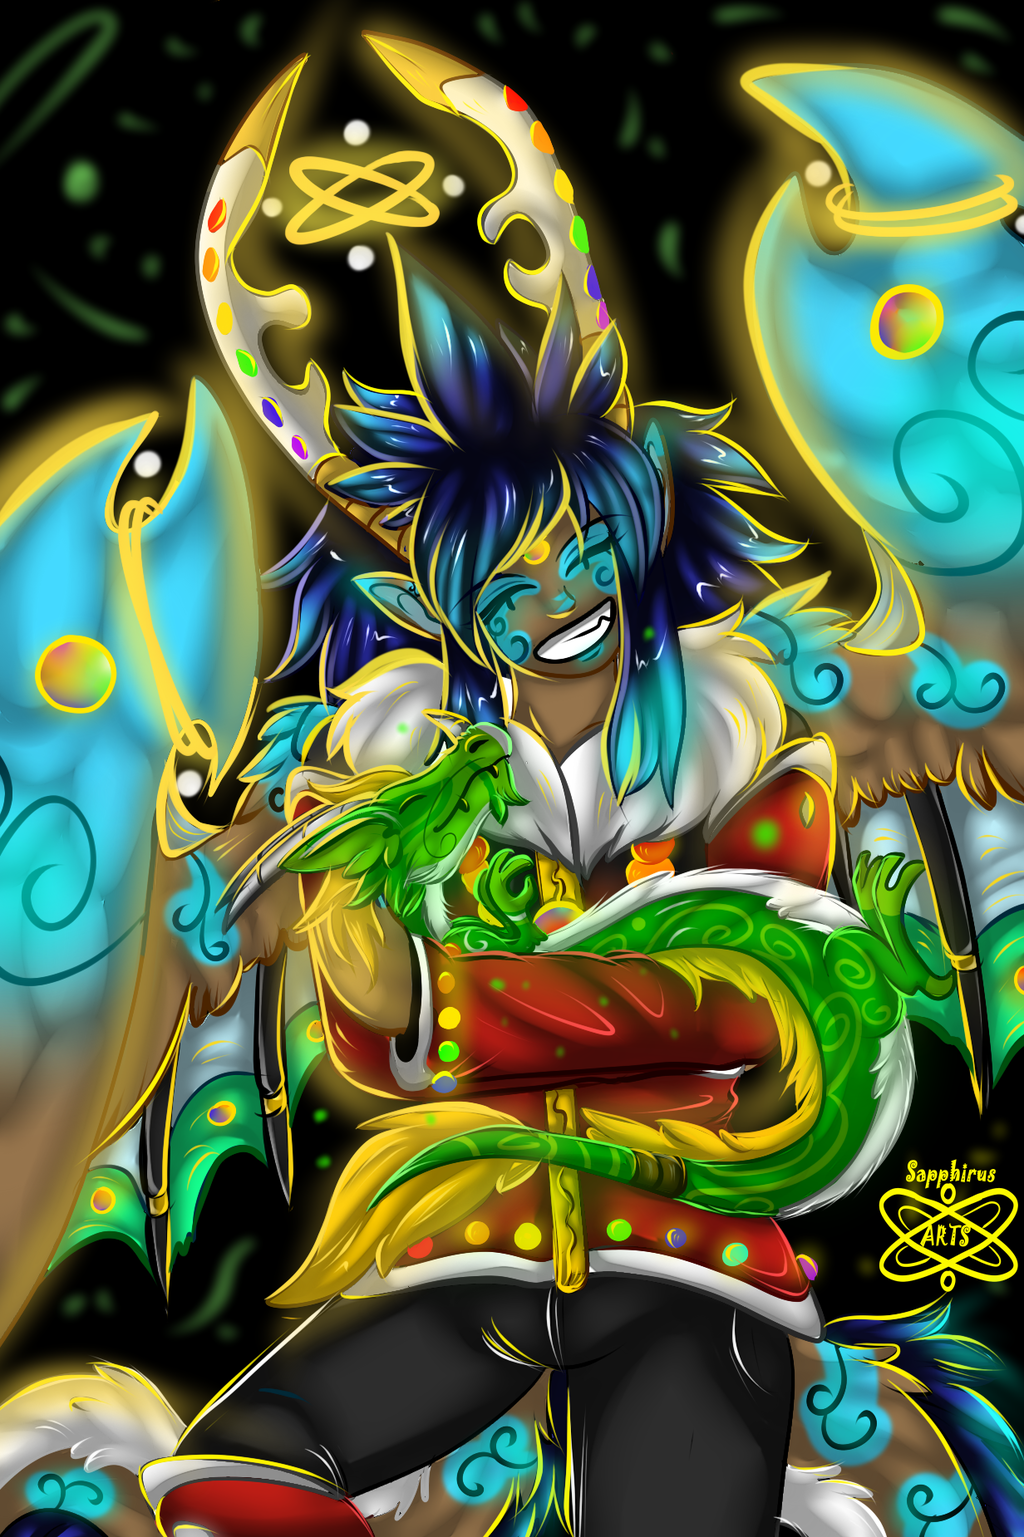 Mother of Dragons +Sapphirus+